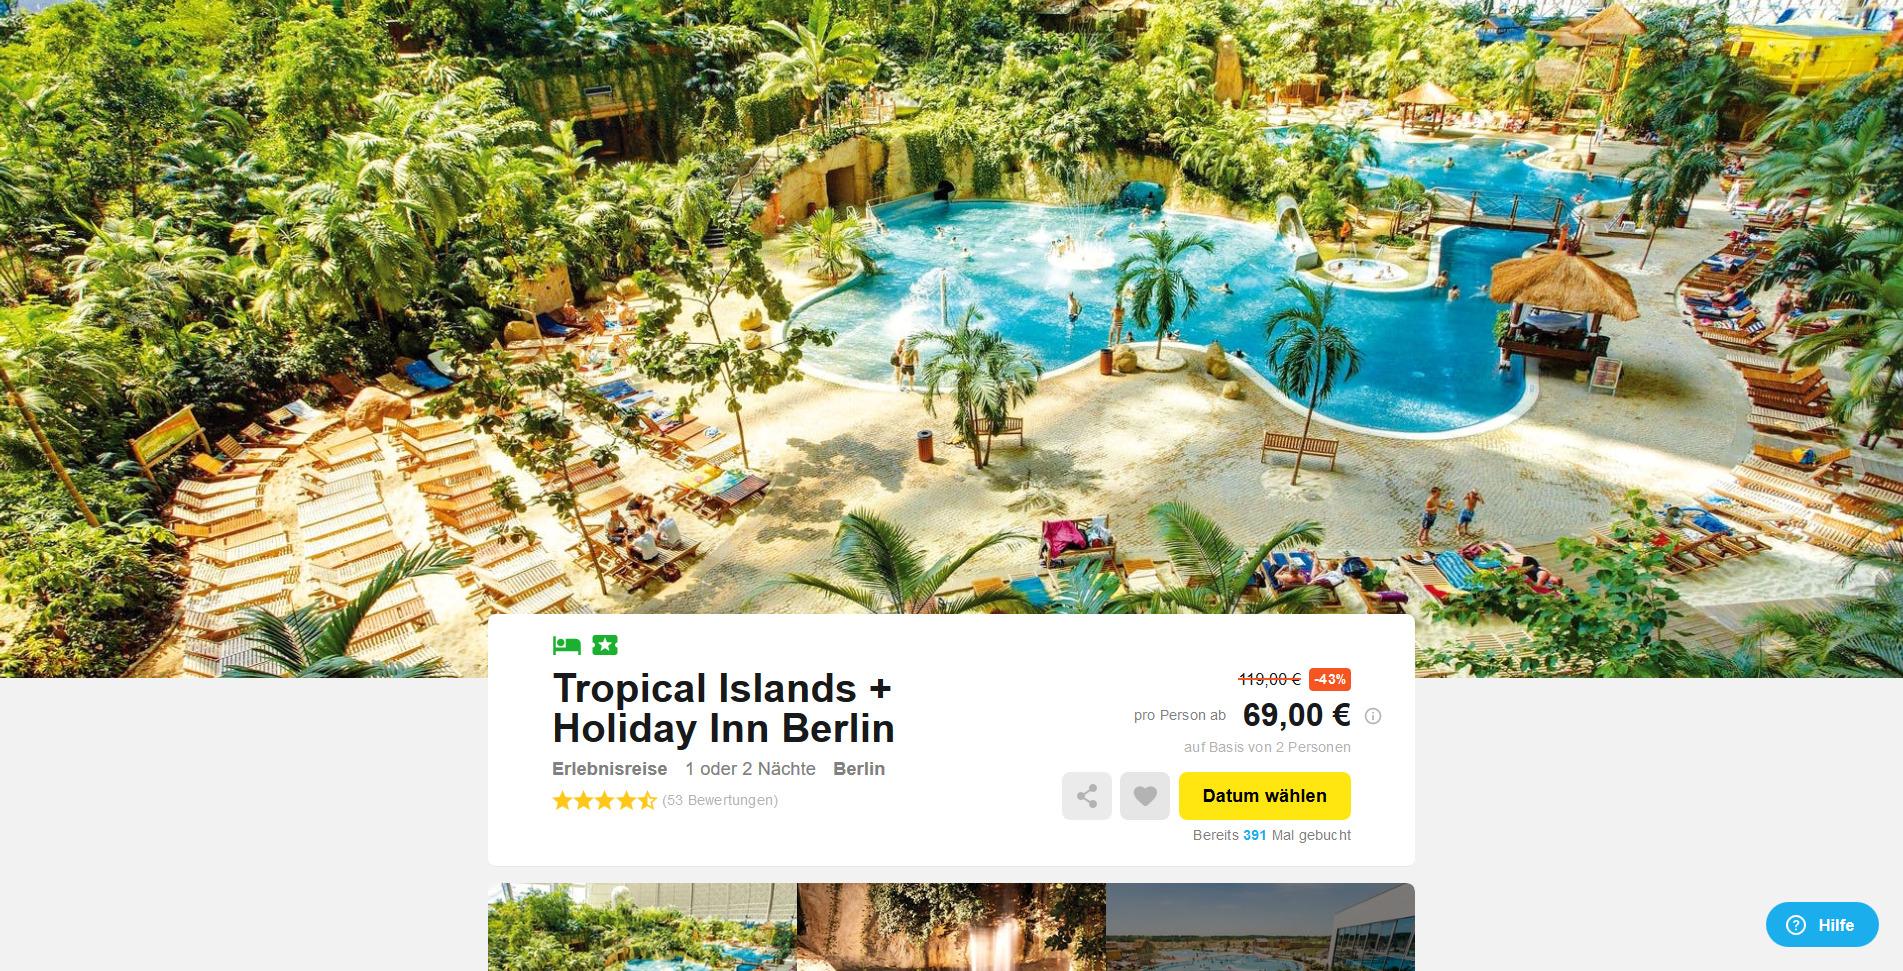 tropical islands 4 sterne hotels in holiday inn berlin. Black Bedroom Furniture Sets. Home Design Ideas